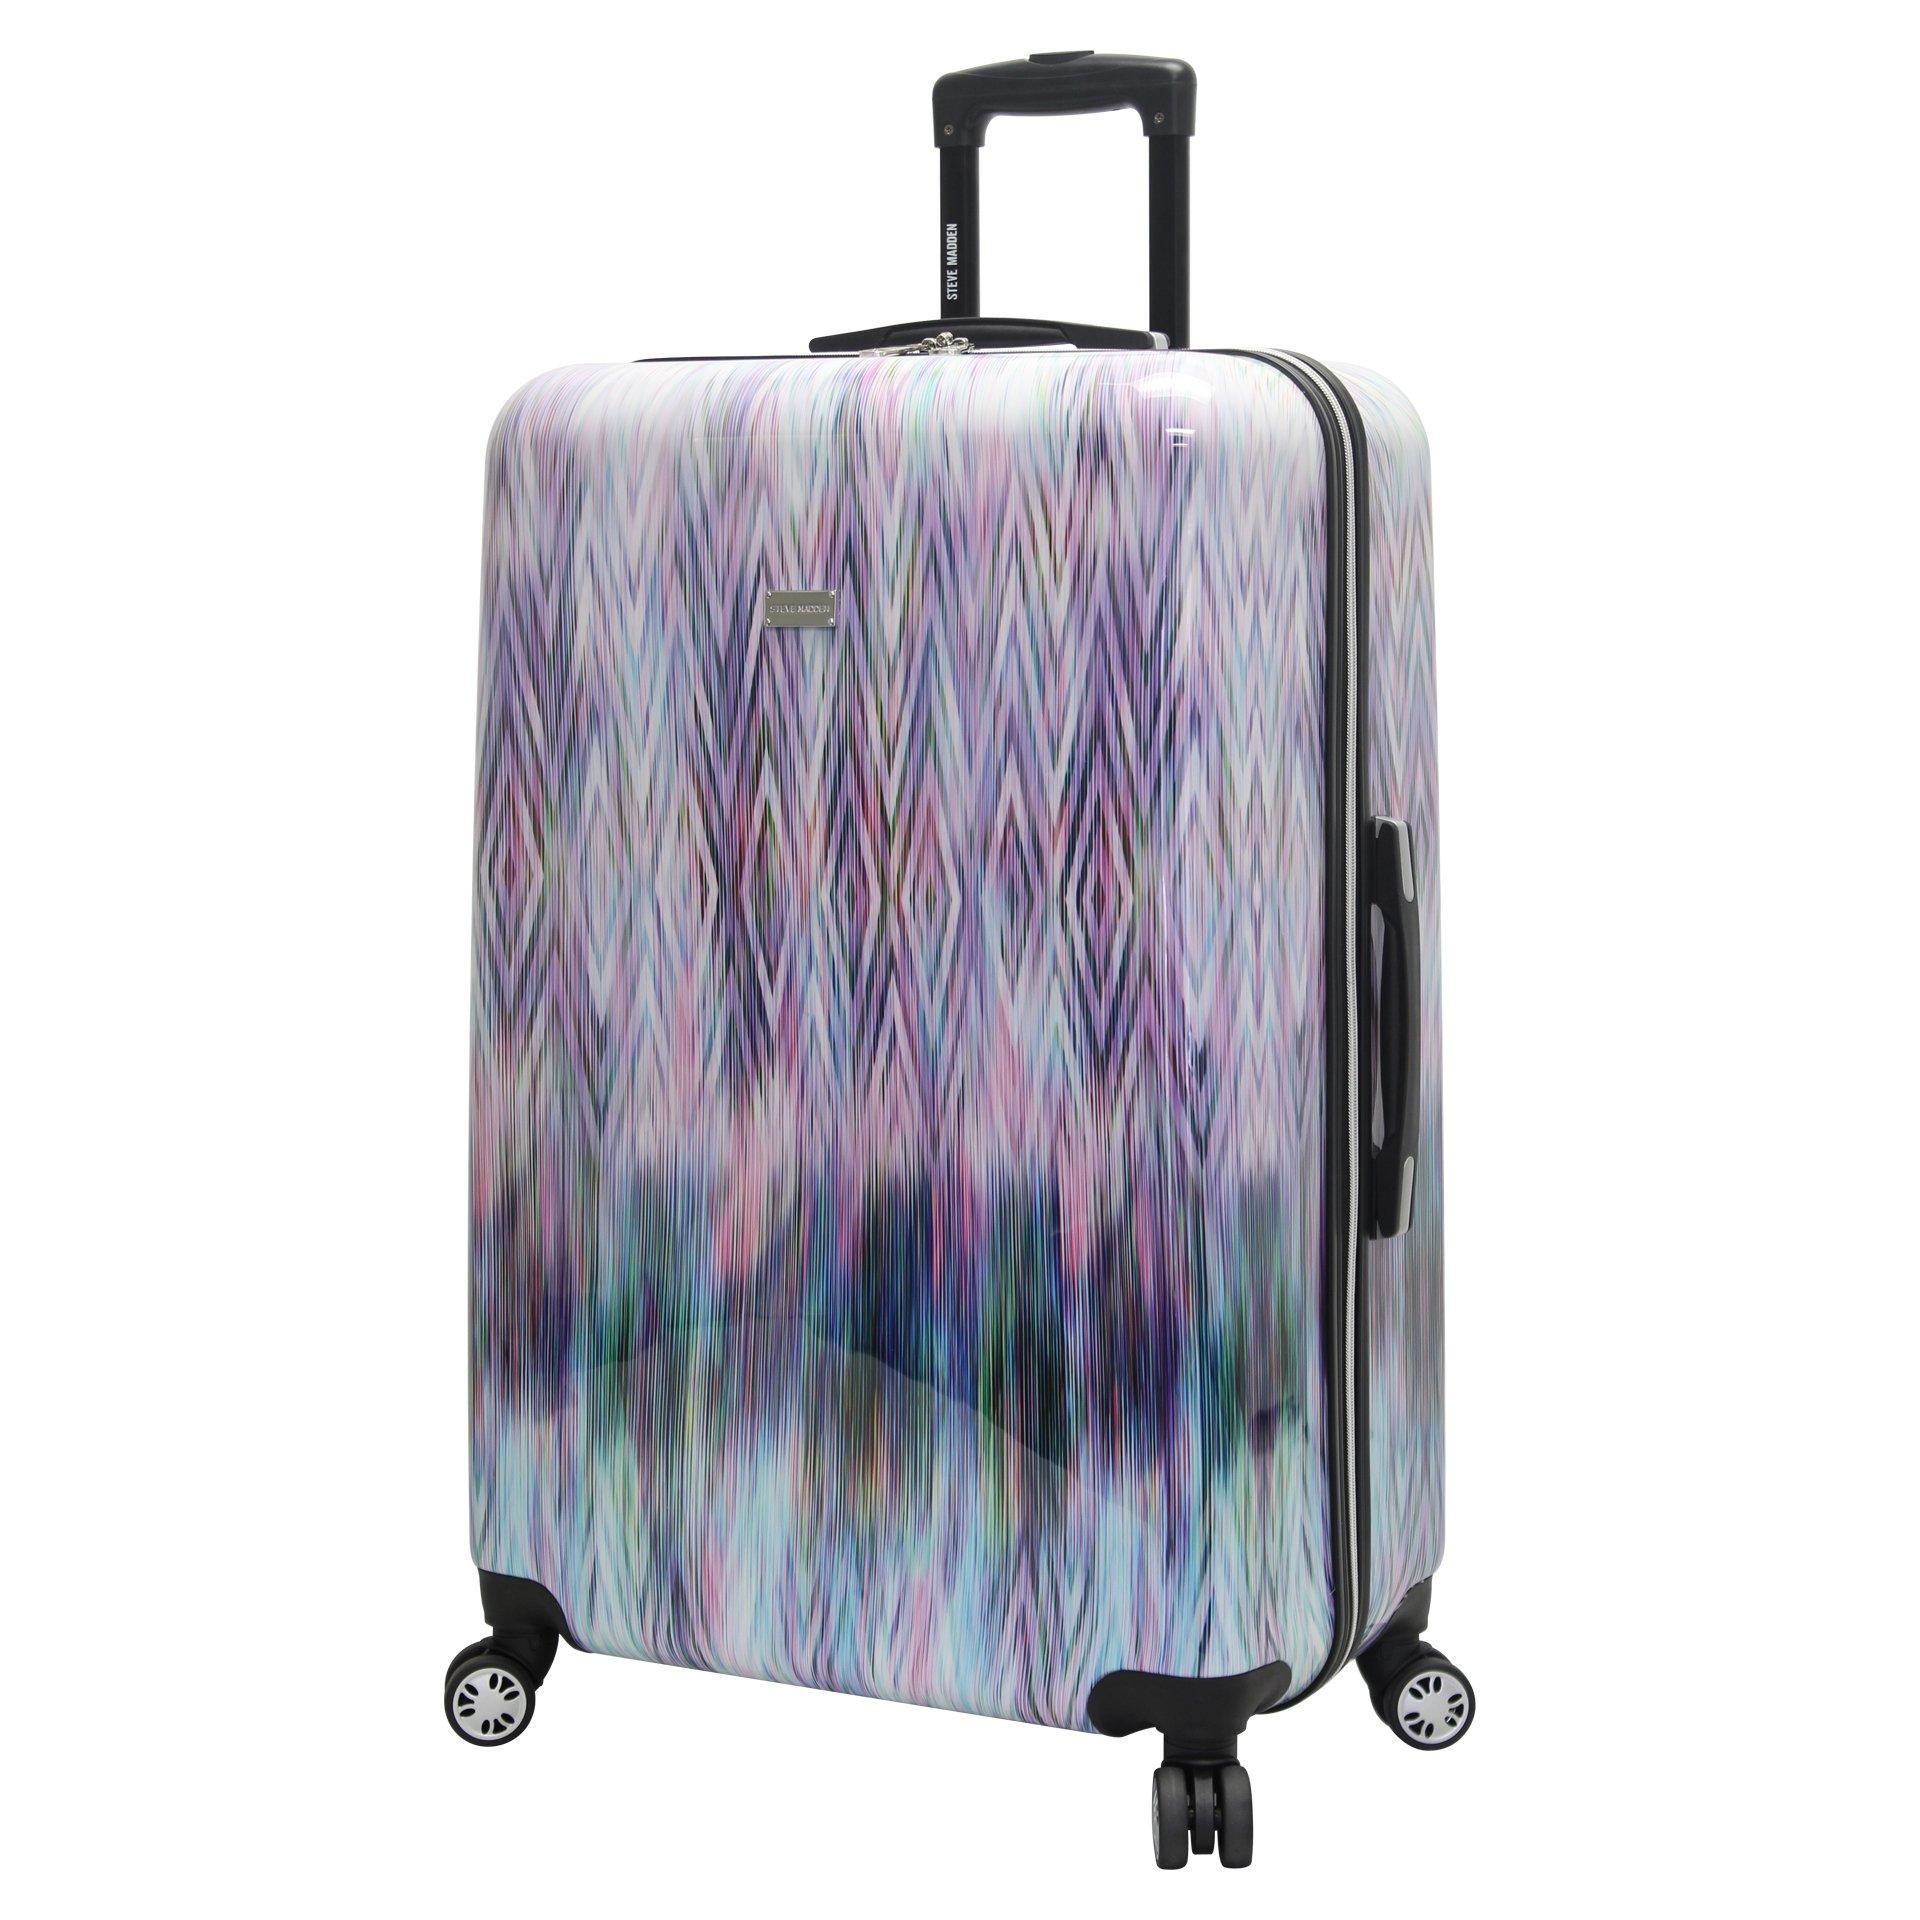 dafd22e0160c Details about Steve Madden Hard Case Luggage 24